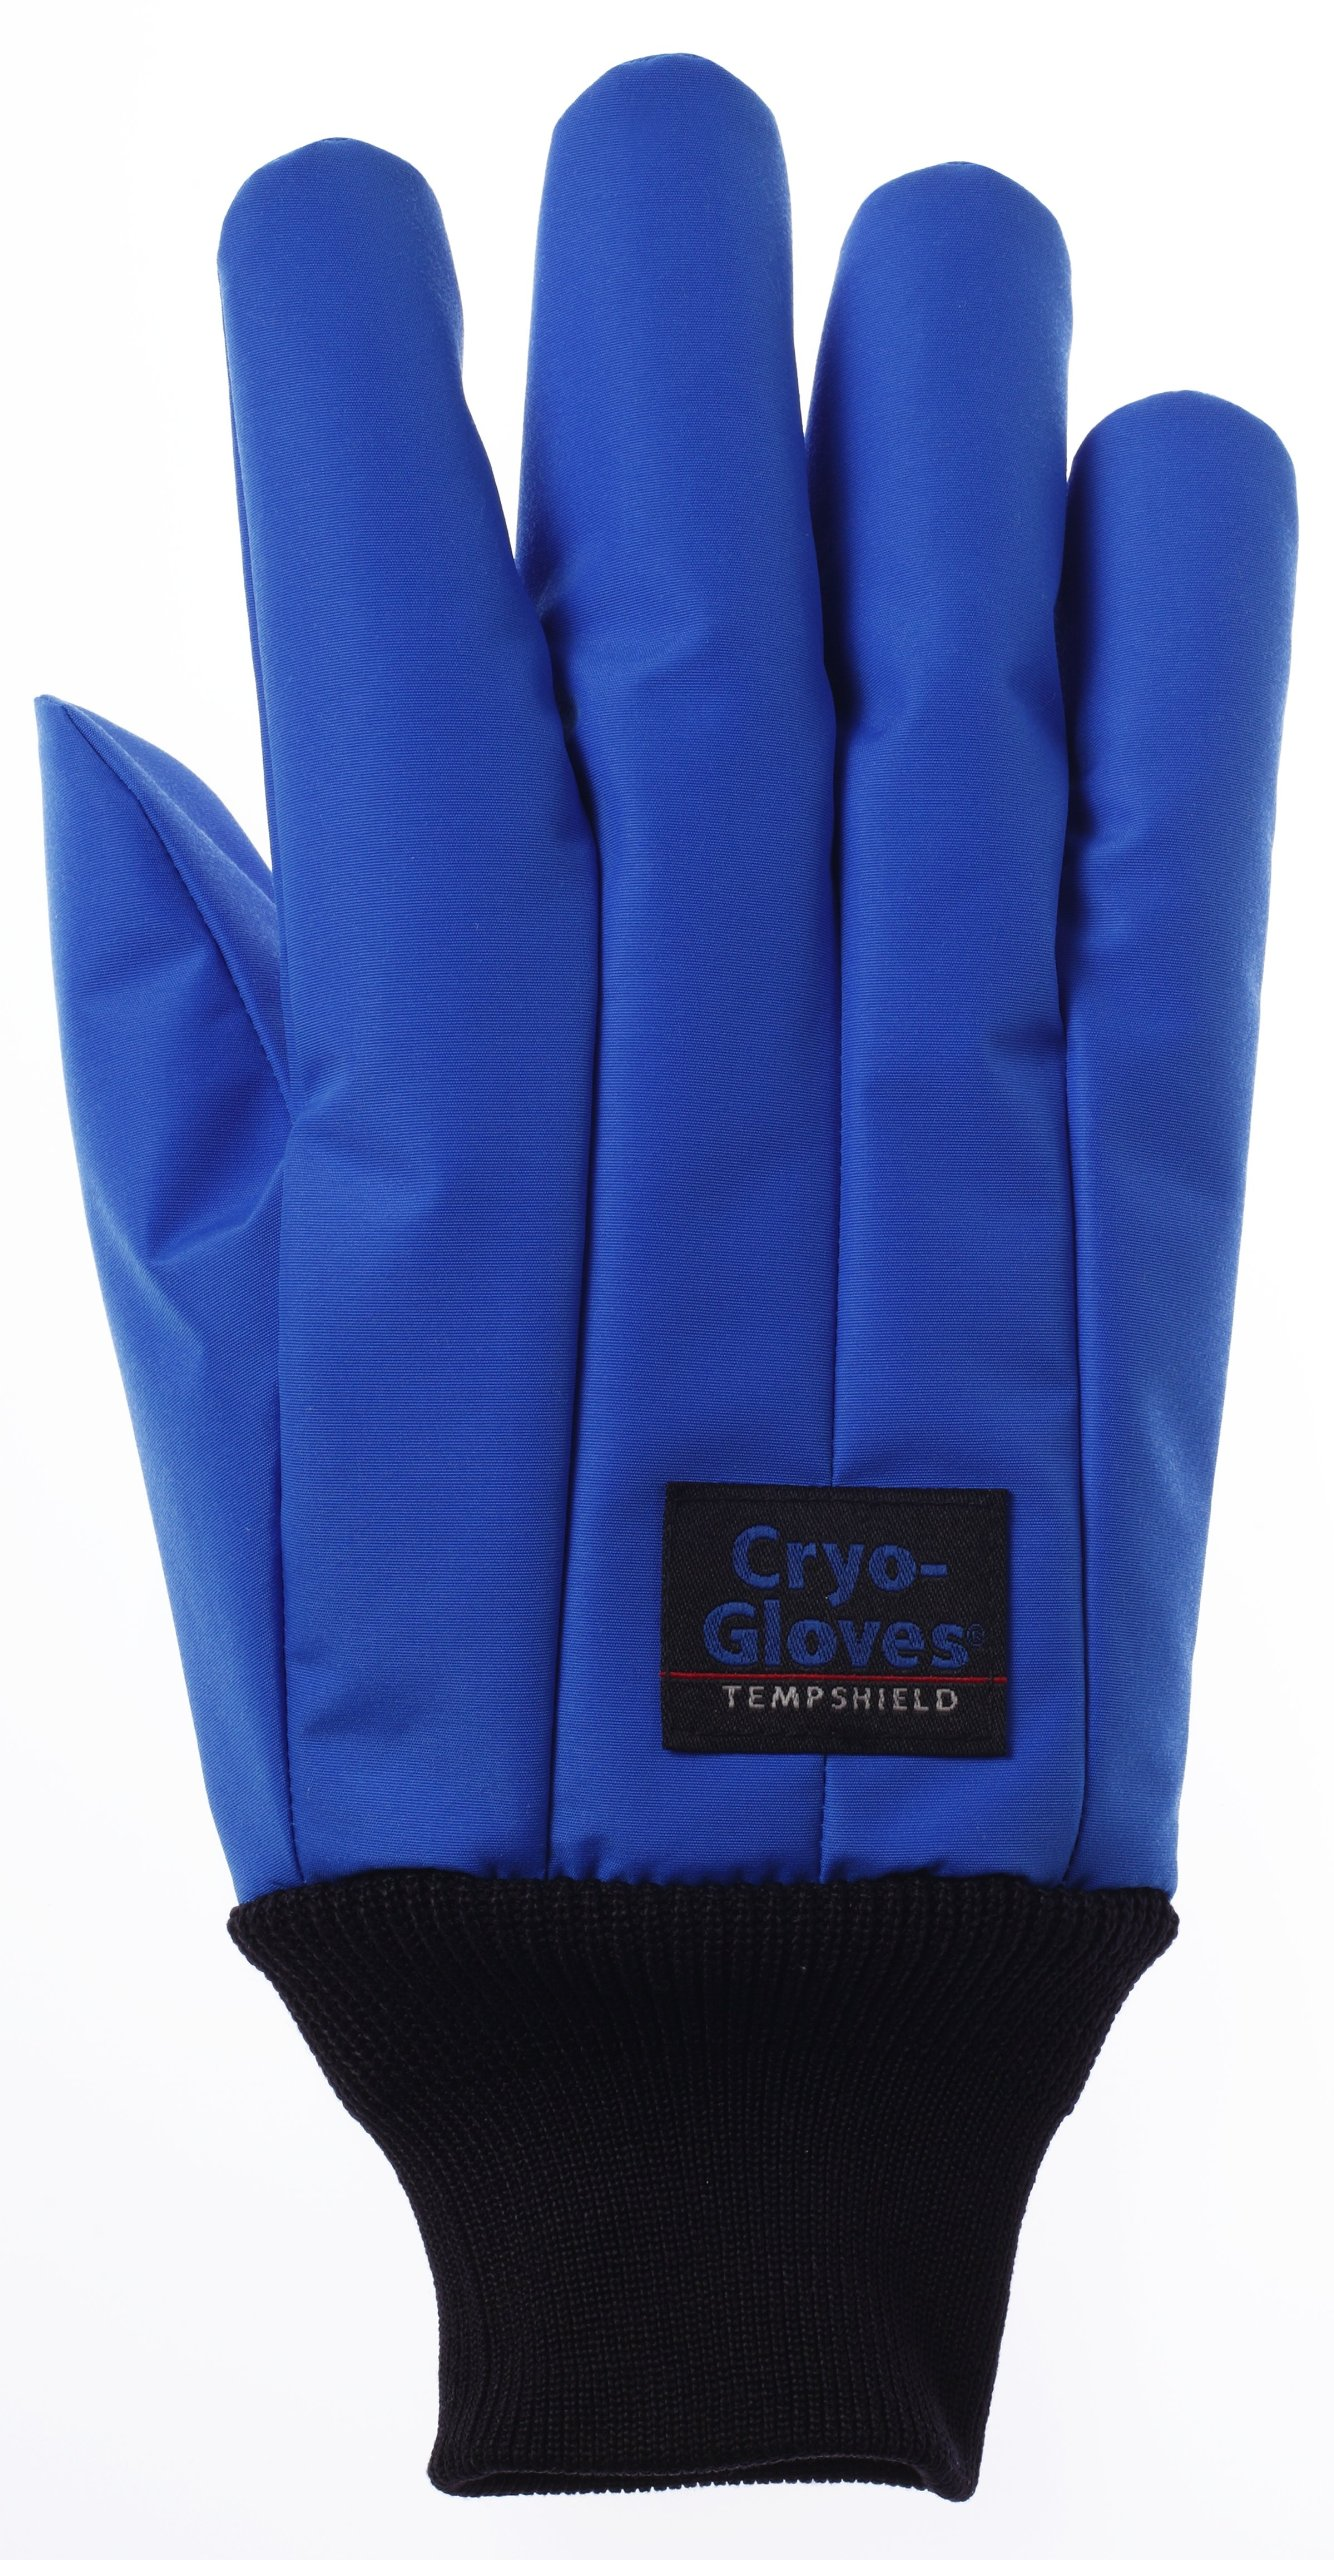 Cryo-Gloves WRS Cryogenic Cryogenic Gloves, Wrist Length, Small